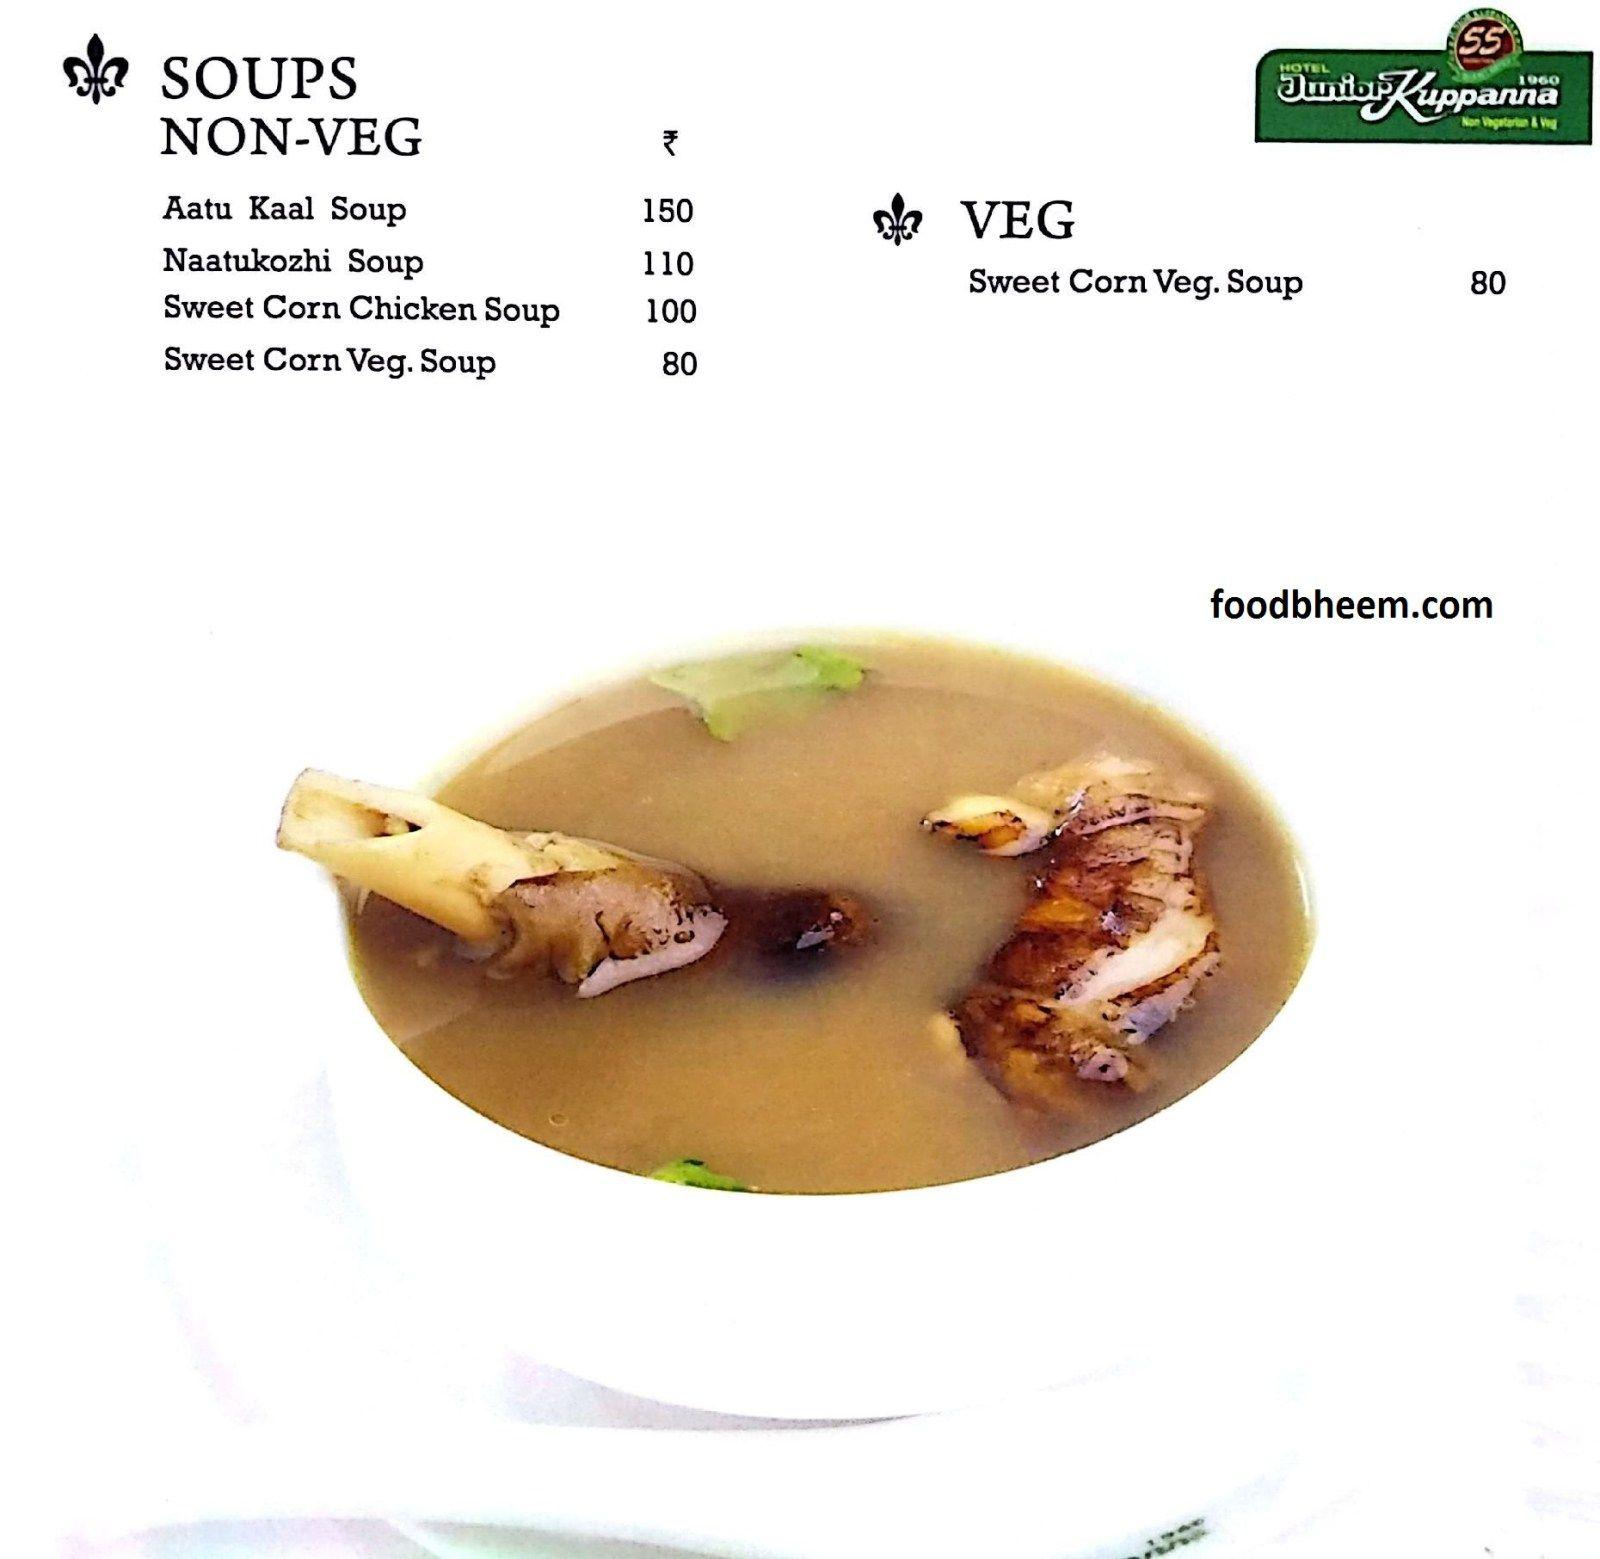 Junior Kuppanna Hitech City Menu Corn Chicken Veg Thali Indian Dishes